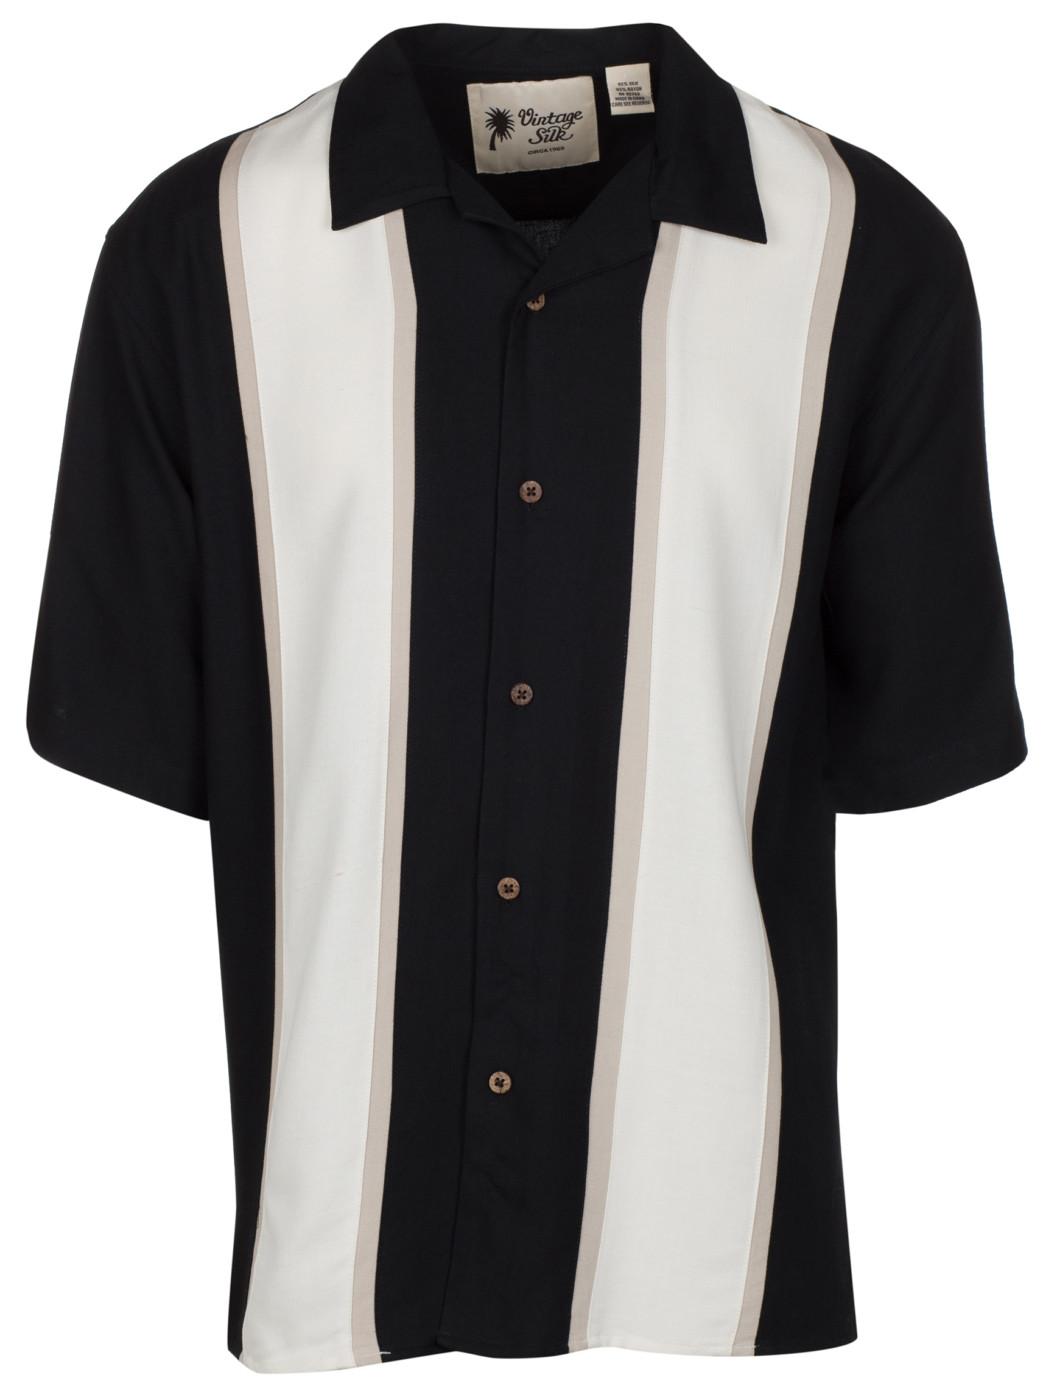 670933d5770d32 Vintage Silk Circa 1969 Men s Black Silk Blend Colorblock Short ...